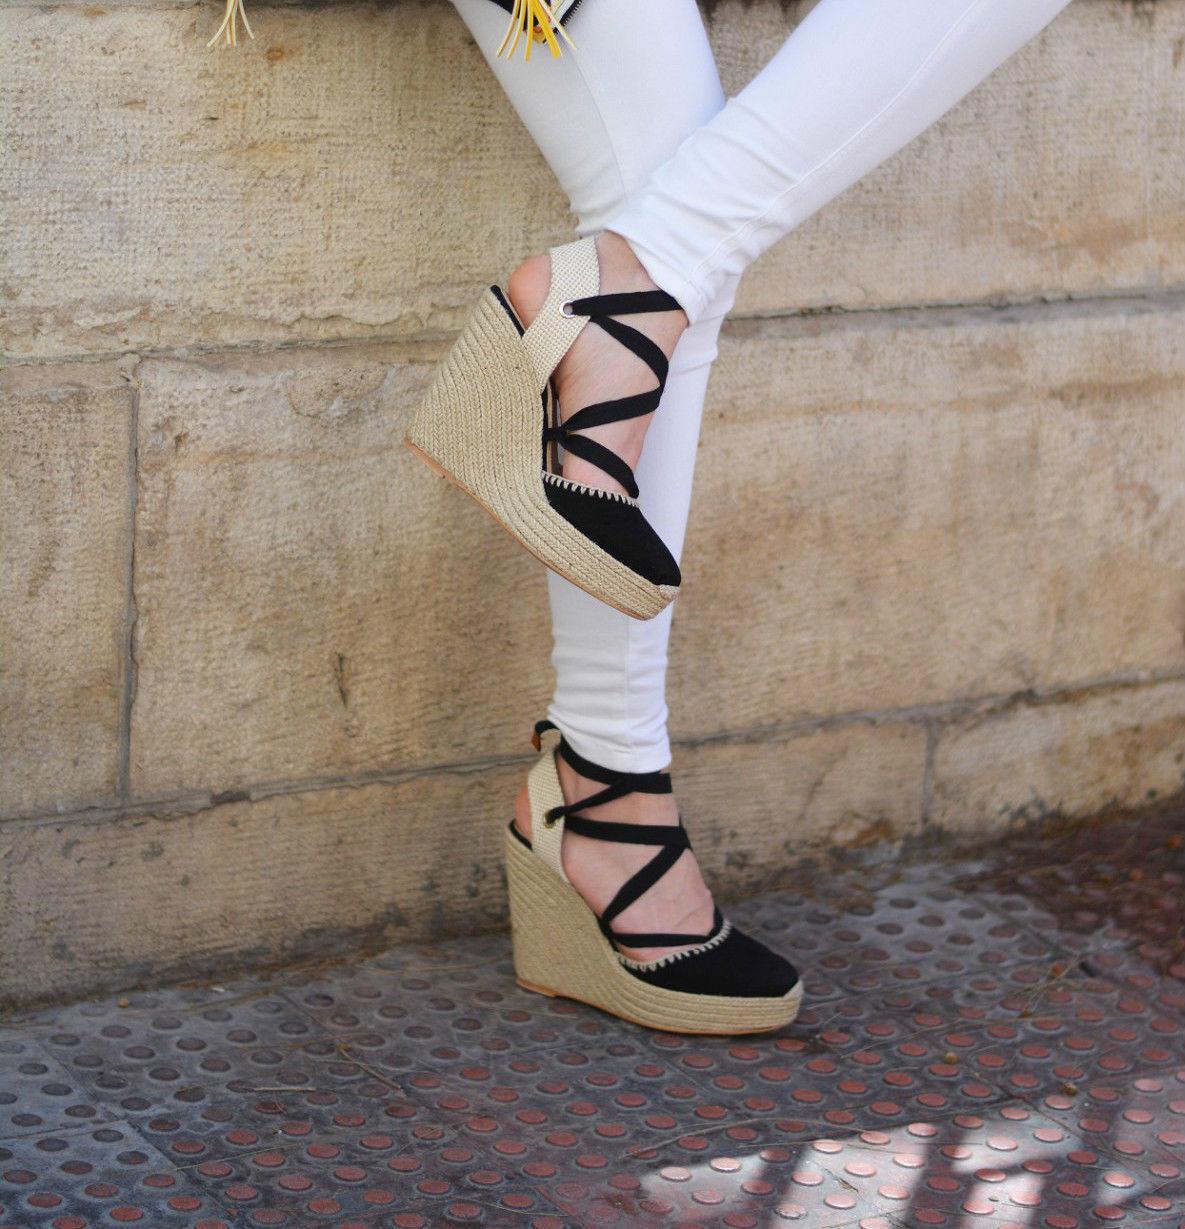 ZARA Damenschuhe Leder Wedges High Heel Schuhes SIZE UK4 UK4 SIZE EUR37 US6.5 c915e8